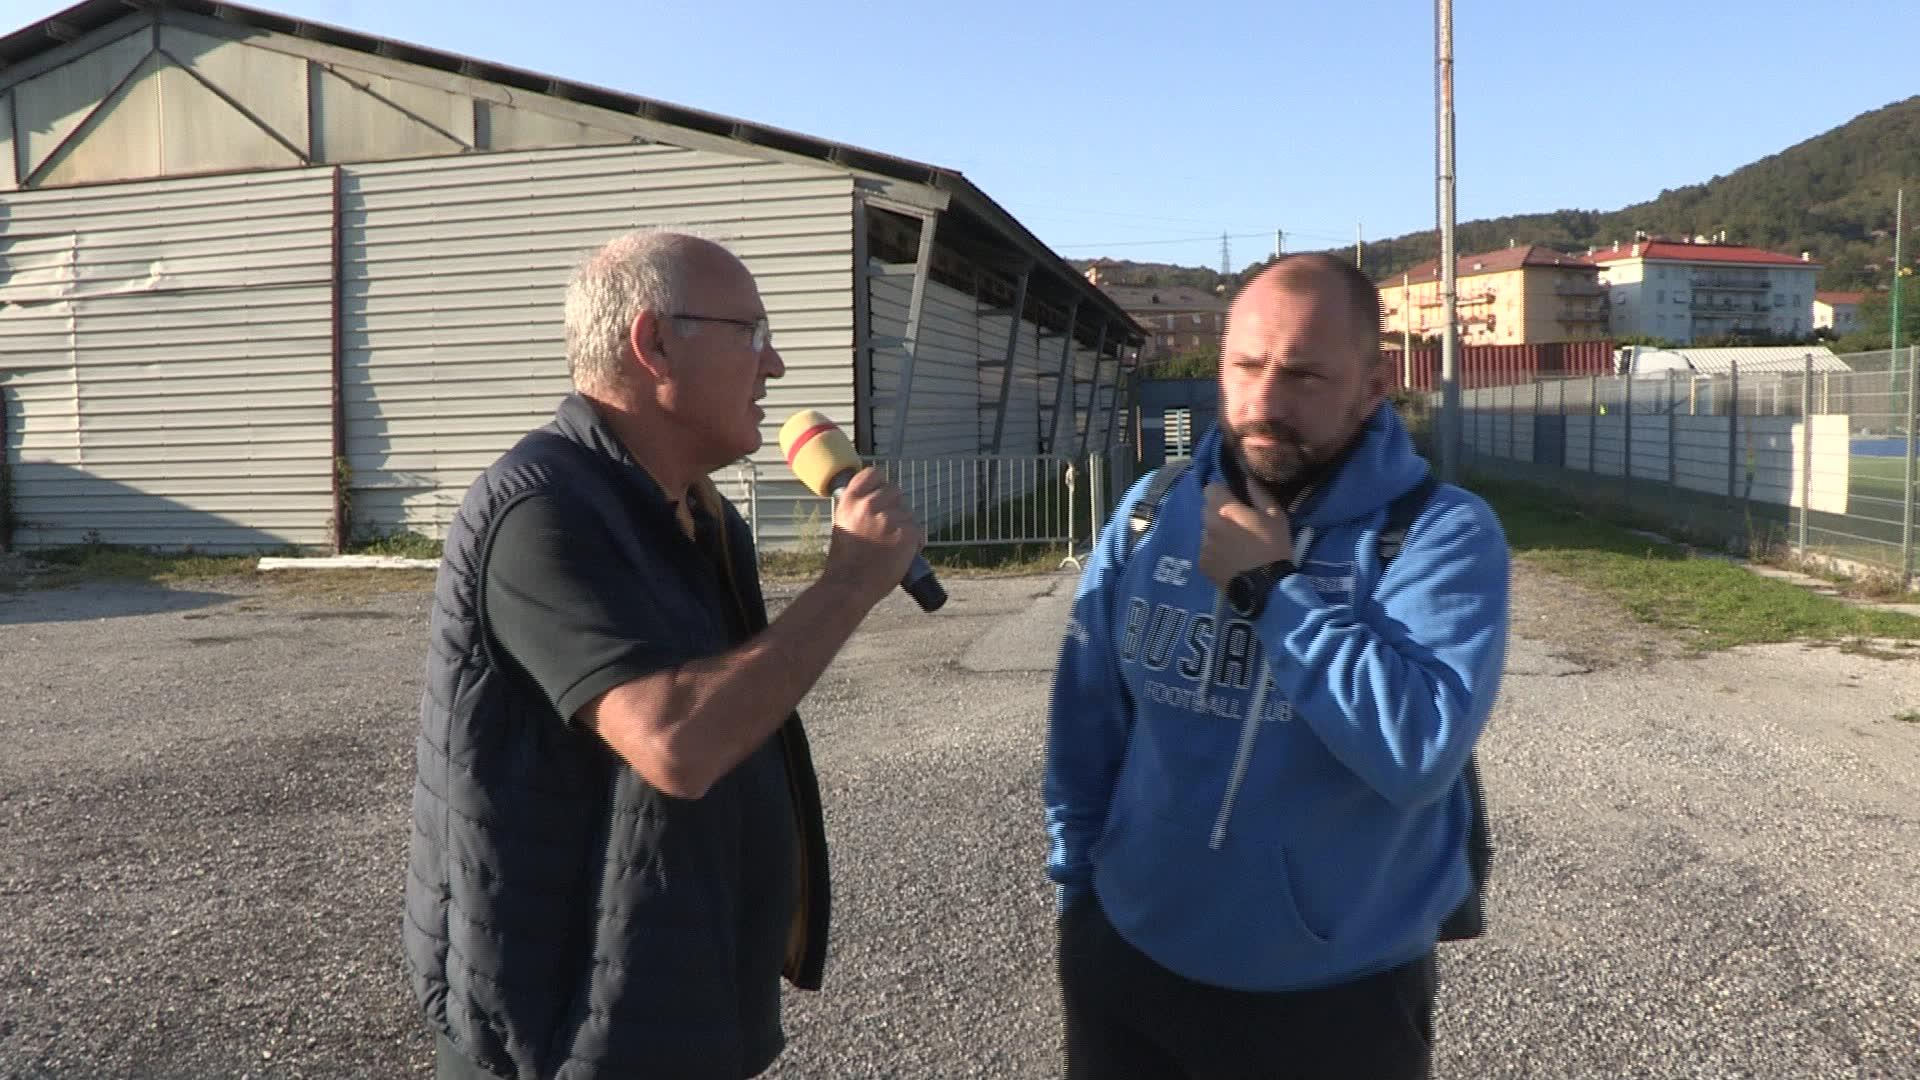 Busalla-Canaletto: intervista a Gianfranco Cannistrà